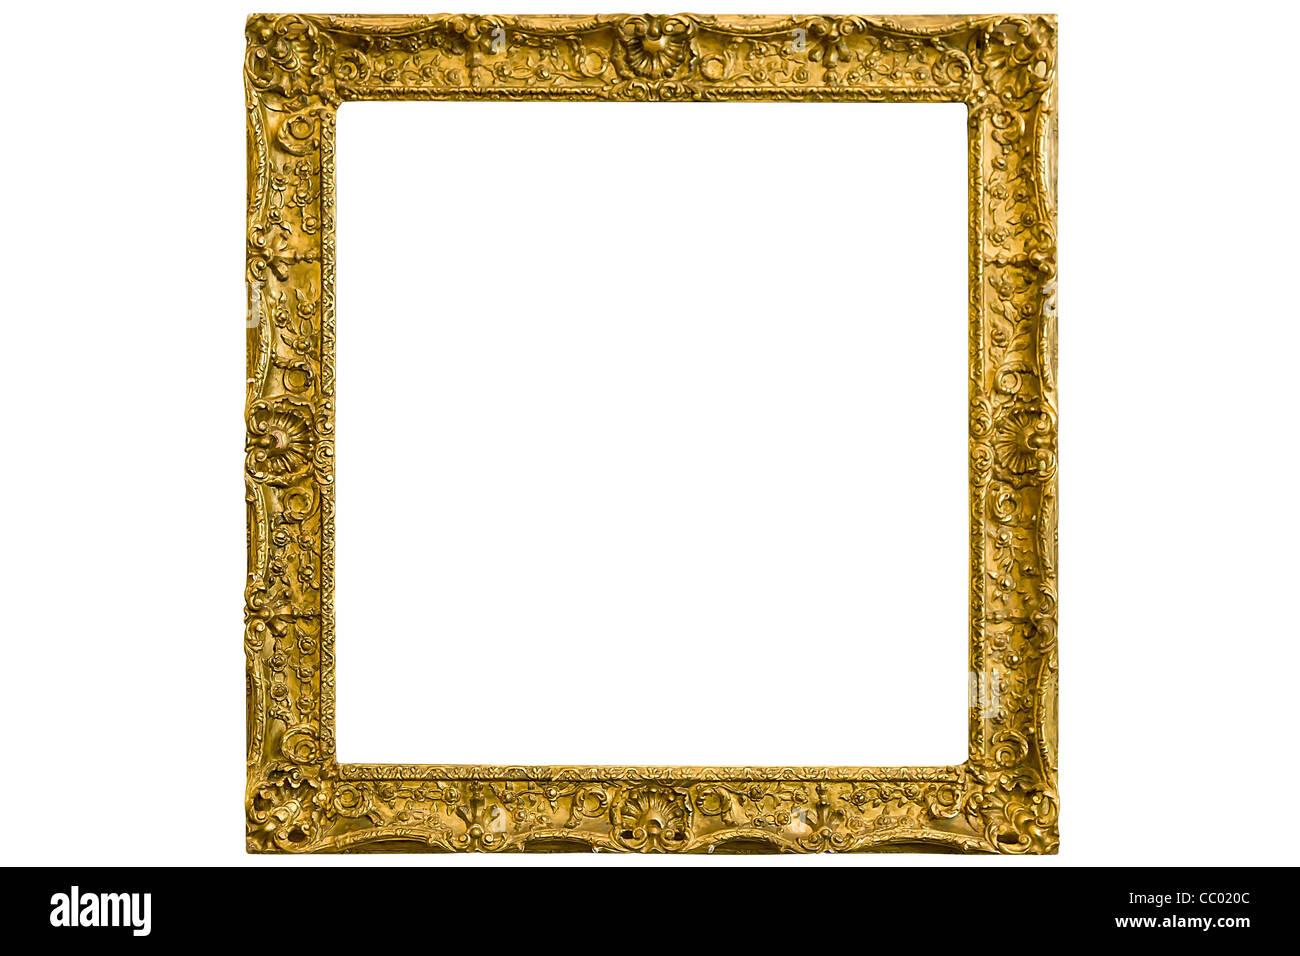 Gilt Gold Frame Stock Photos & Gilt Gold Frame Stock Images - Alamy